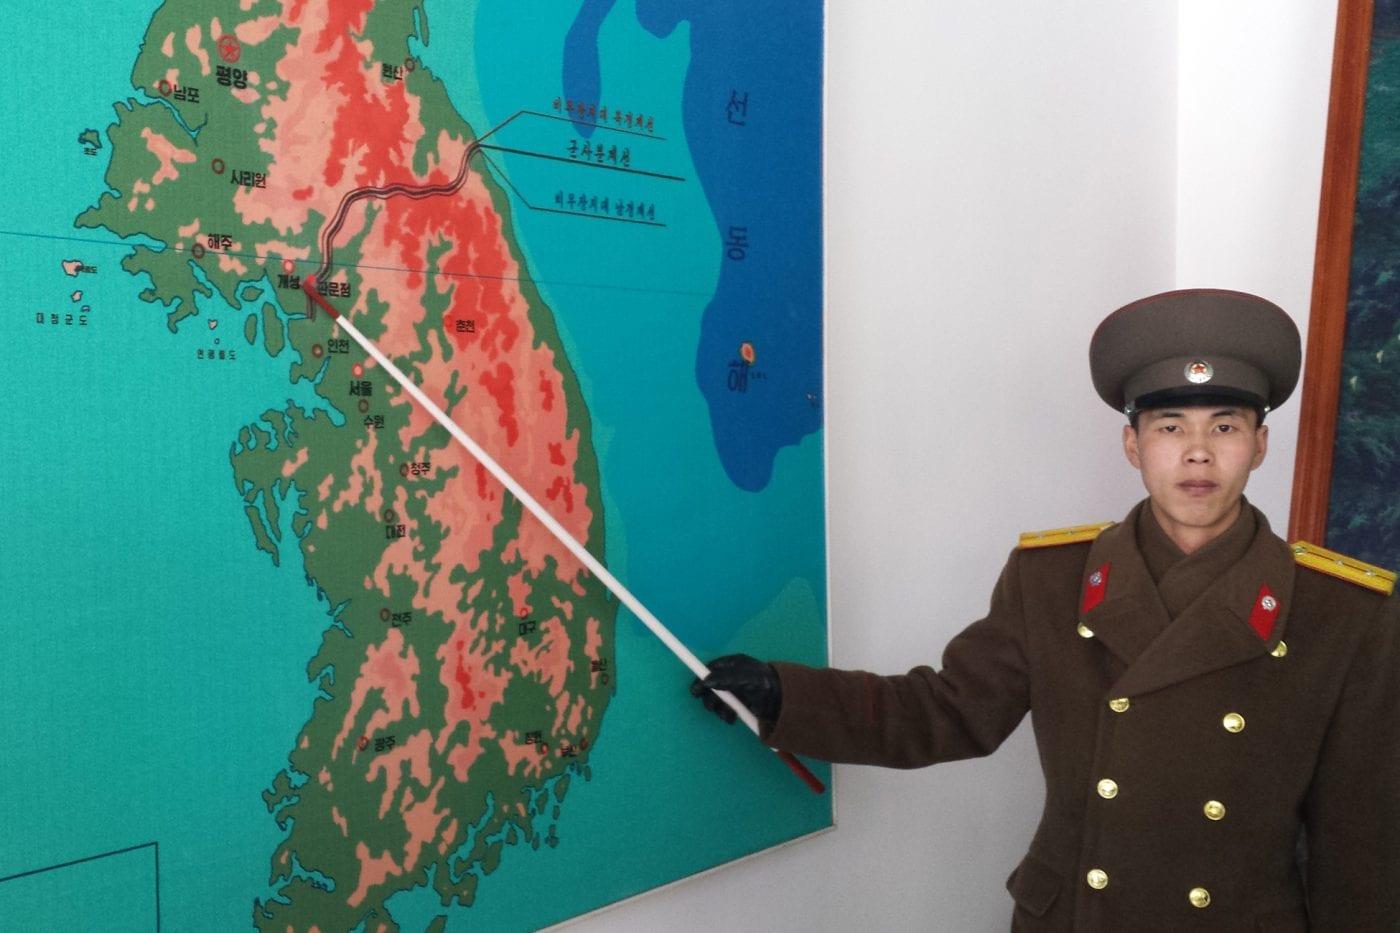 north korea soilder giving us a history lesson 2